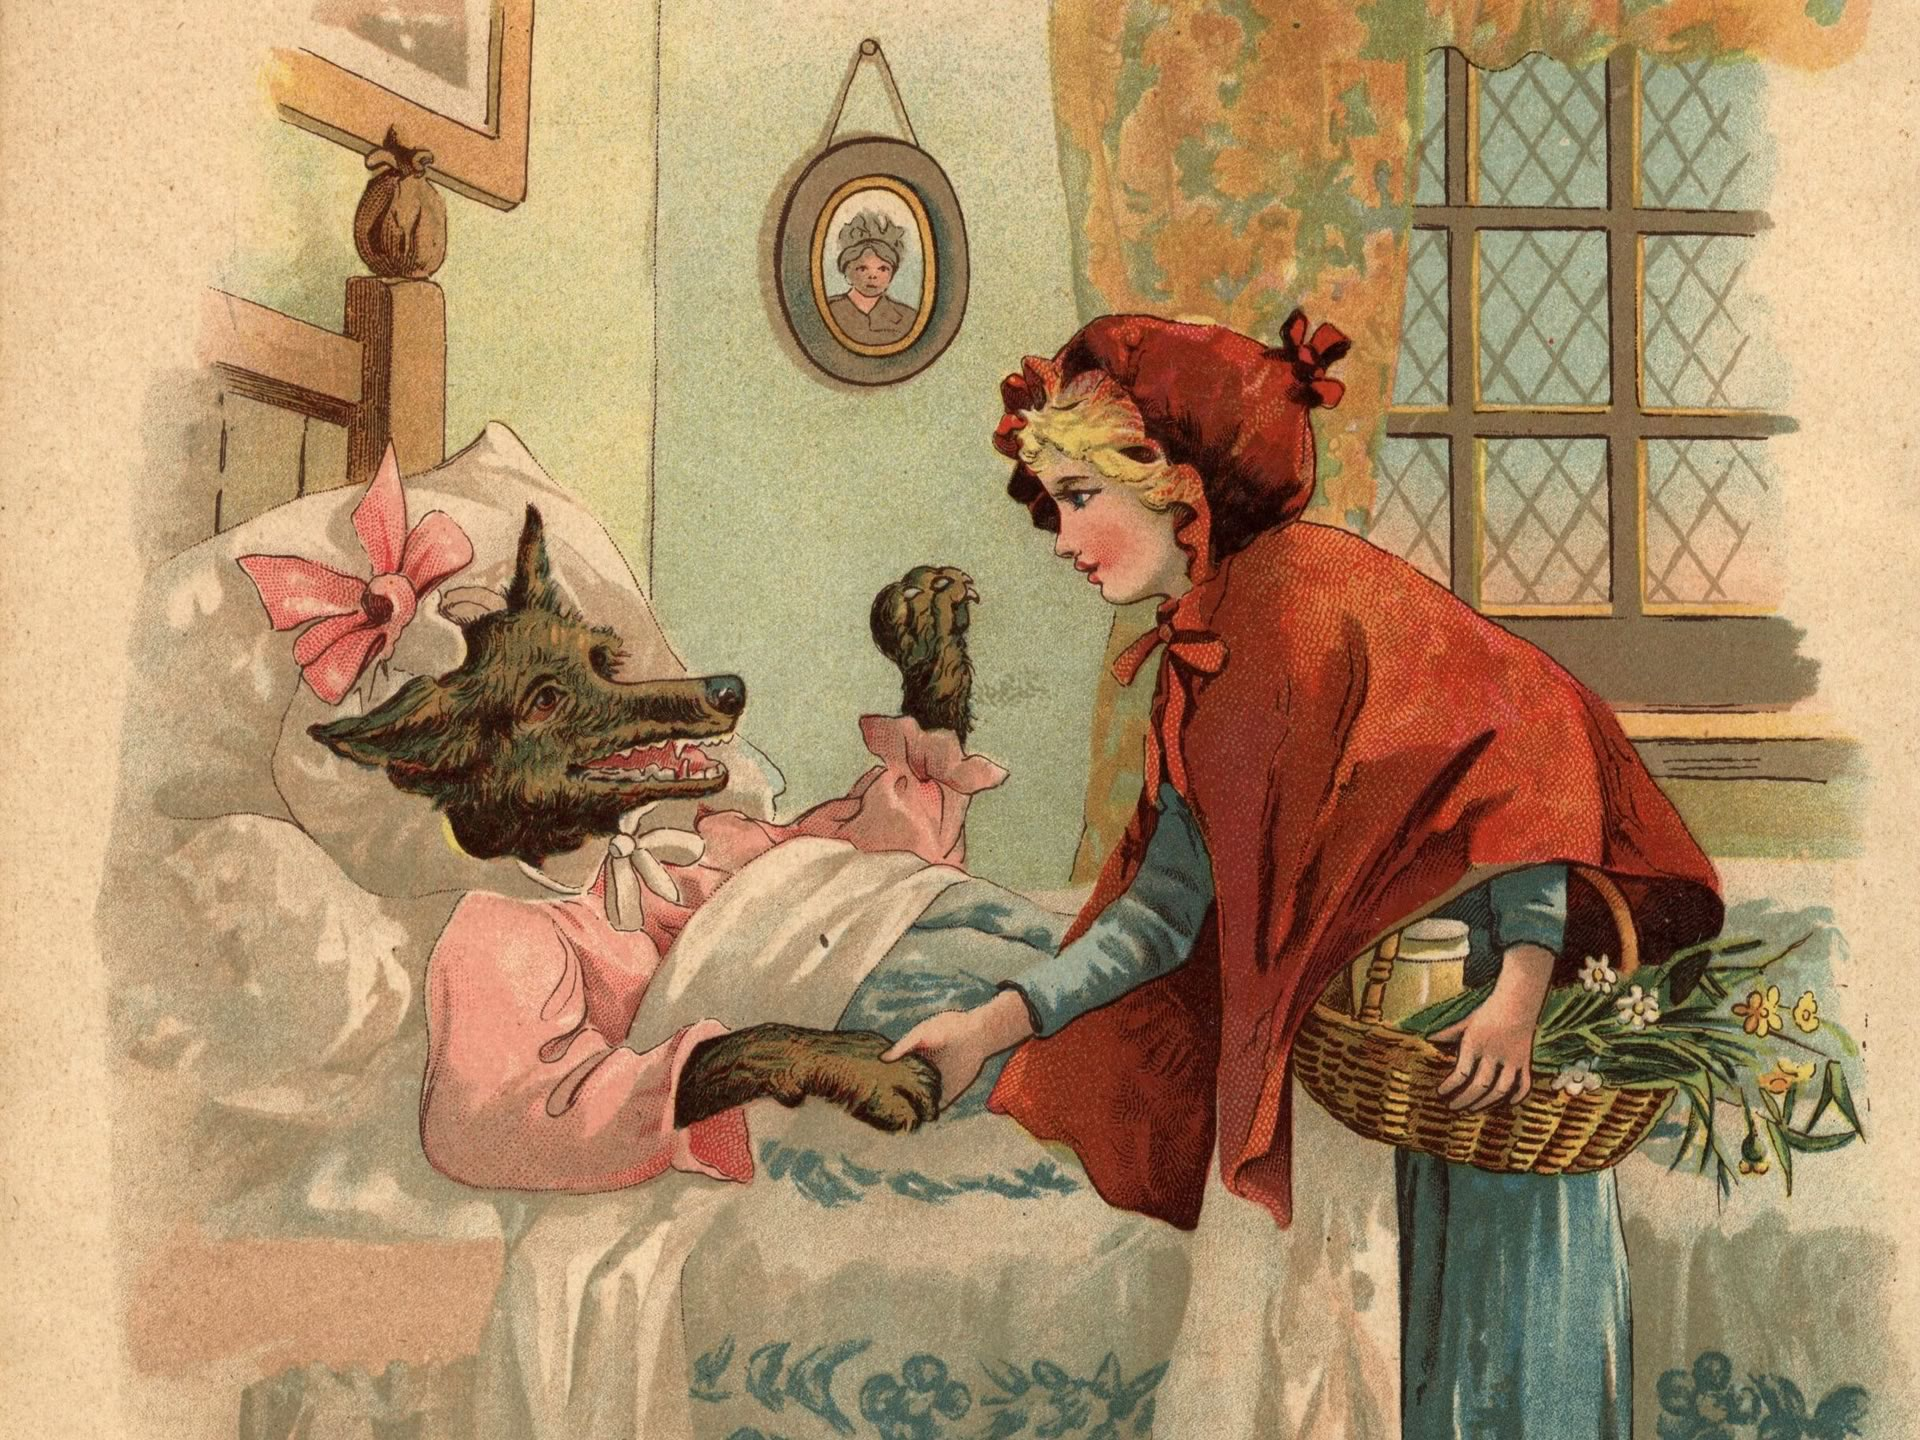 Fonkelnieuw Leuk voor kids – wallpaper: Roodkapje en de Grote Boze Wolf in JD-15